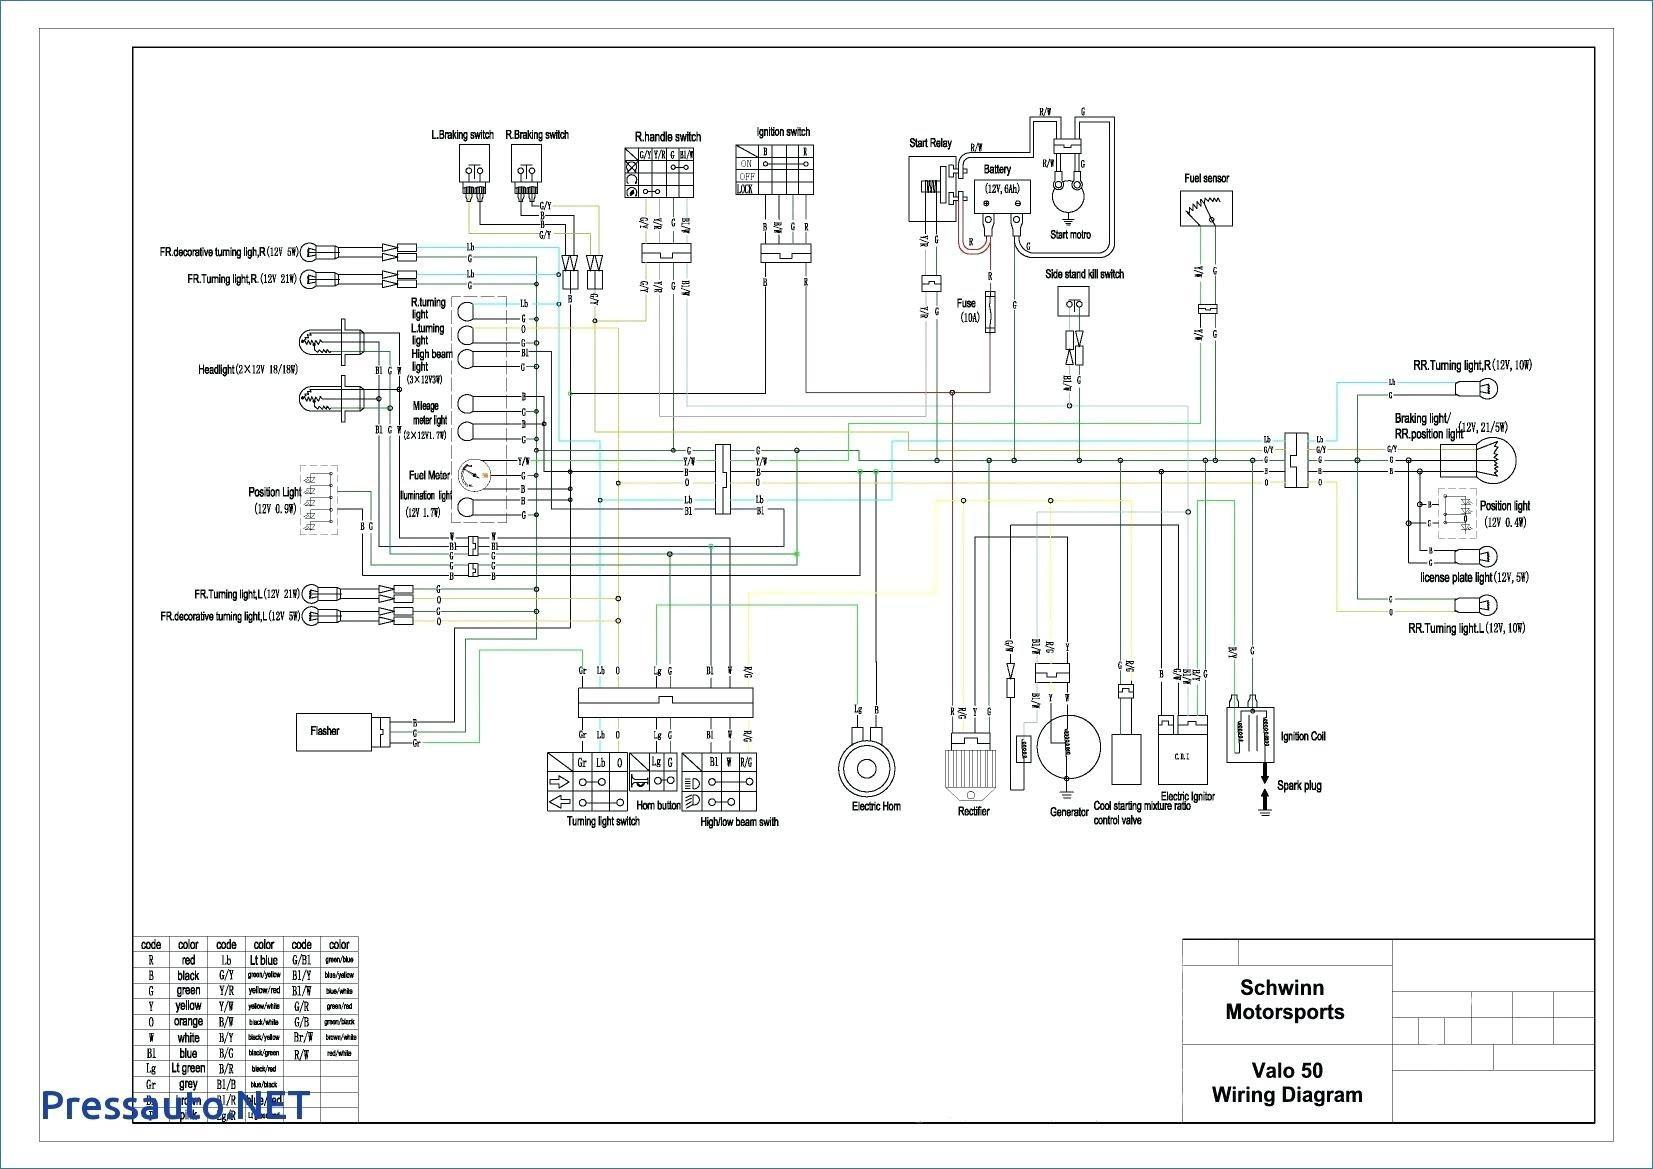 Dish Network Wiring Diagram